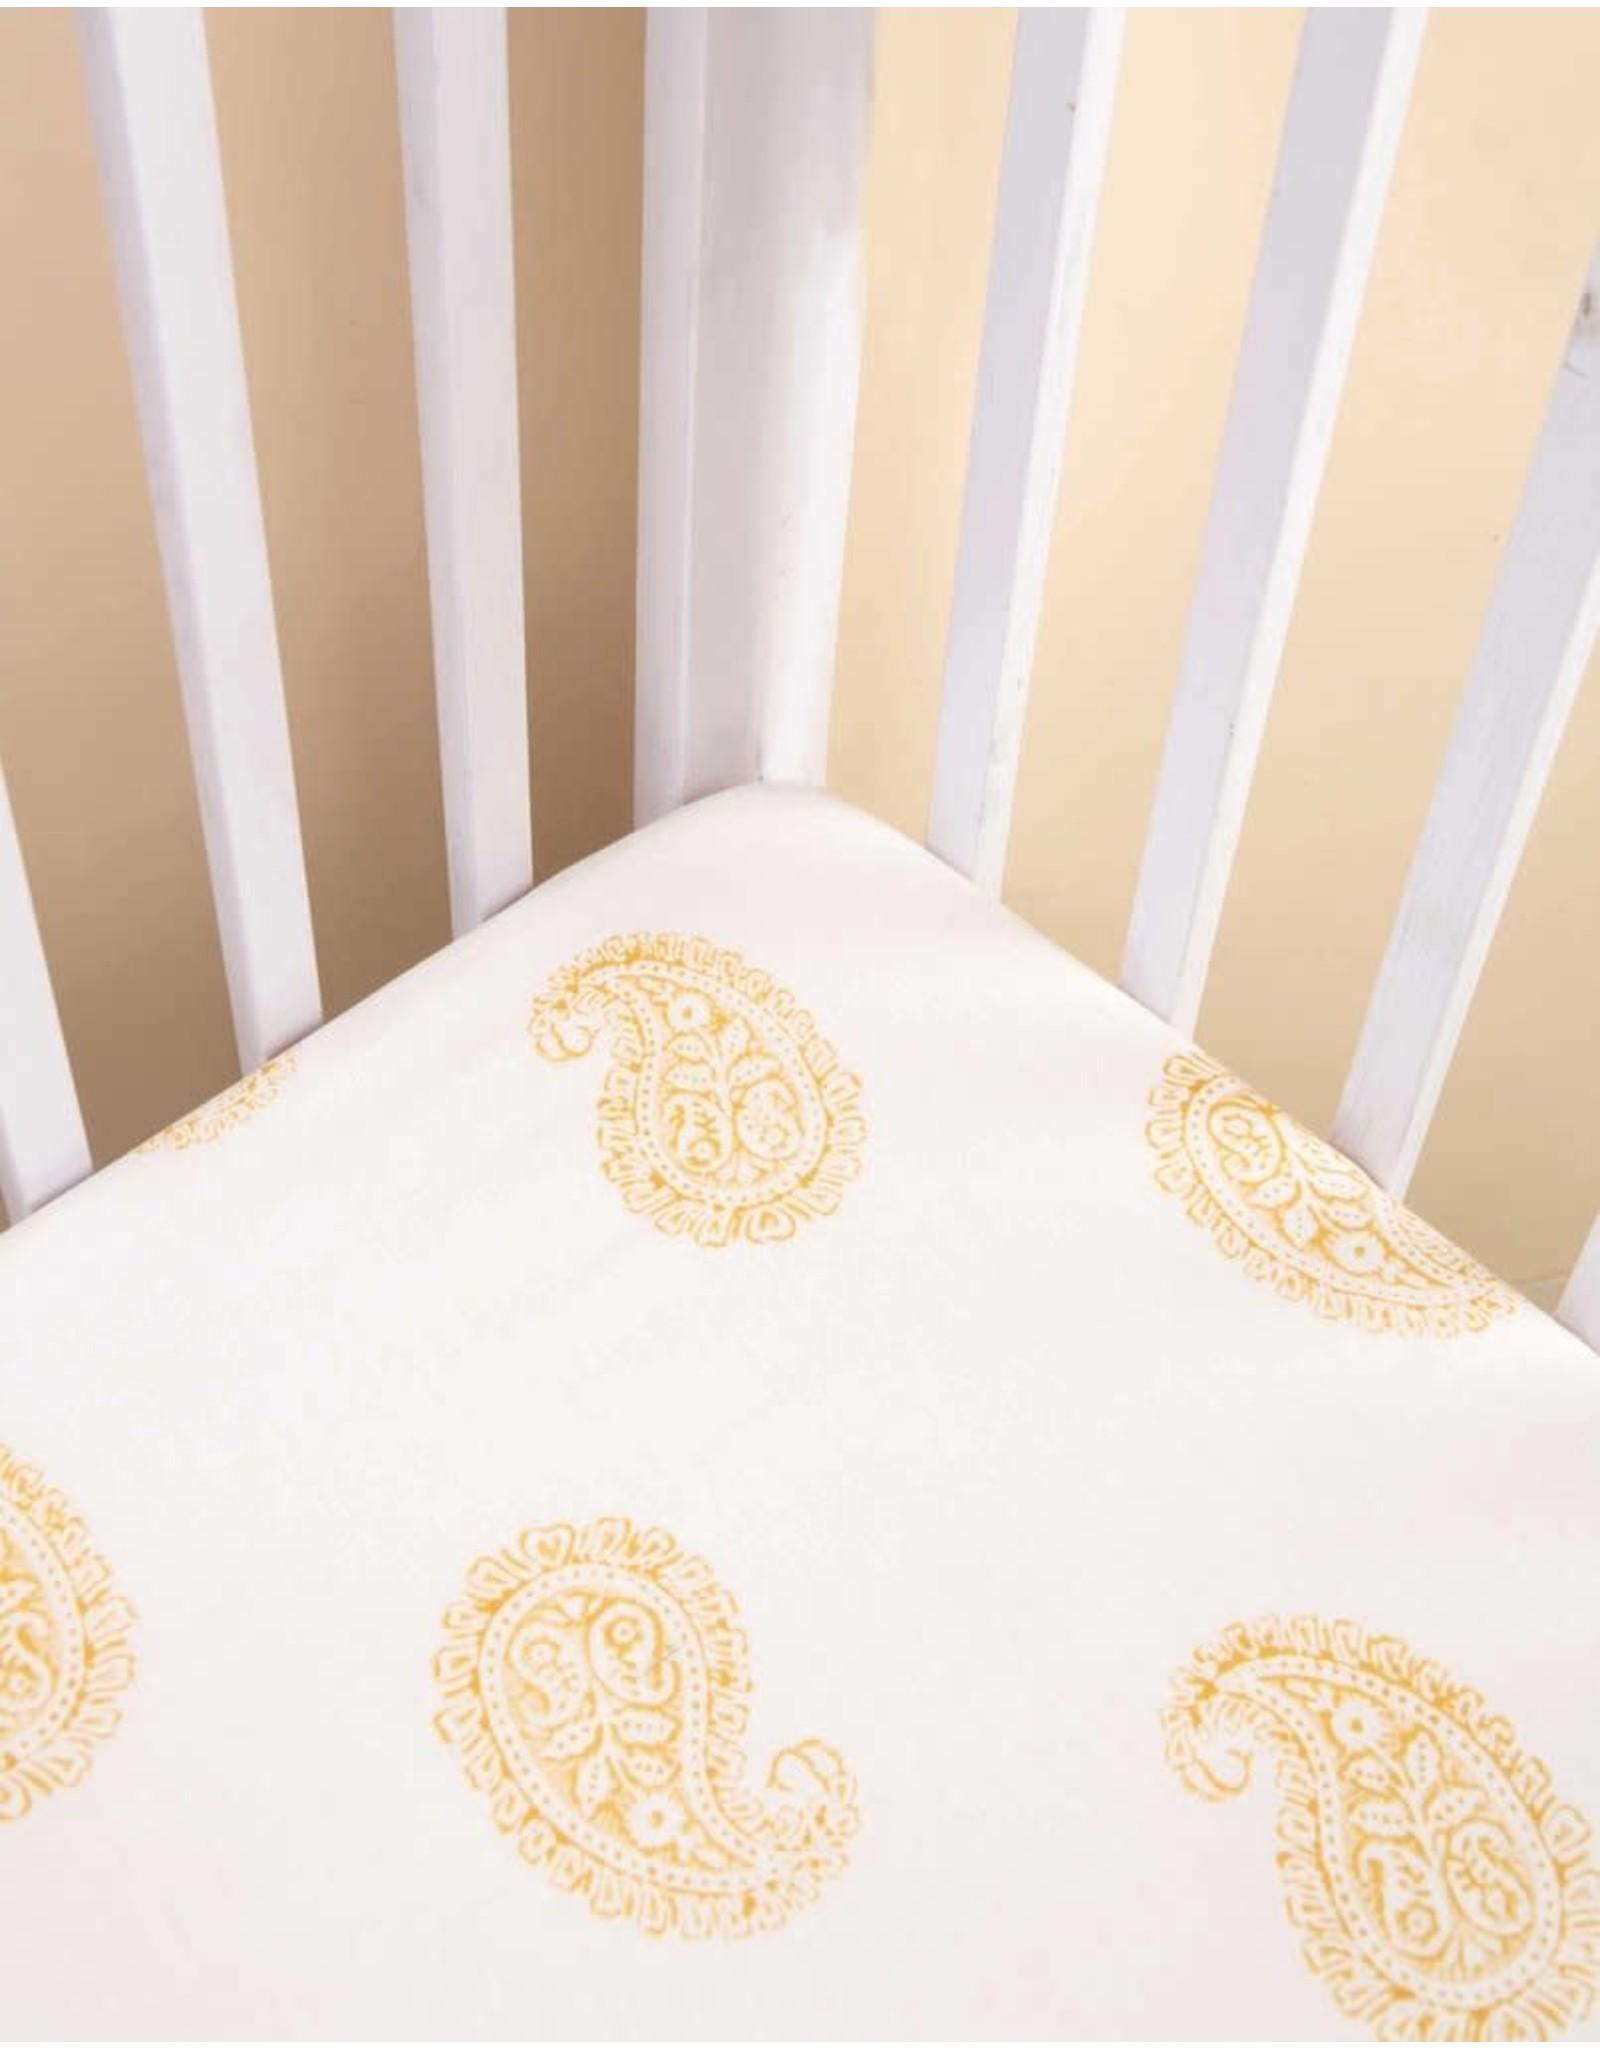 Malabar Baby Fitted Crib Sheet (mustard paisley) | Malabar Baby